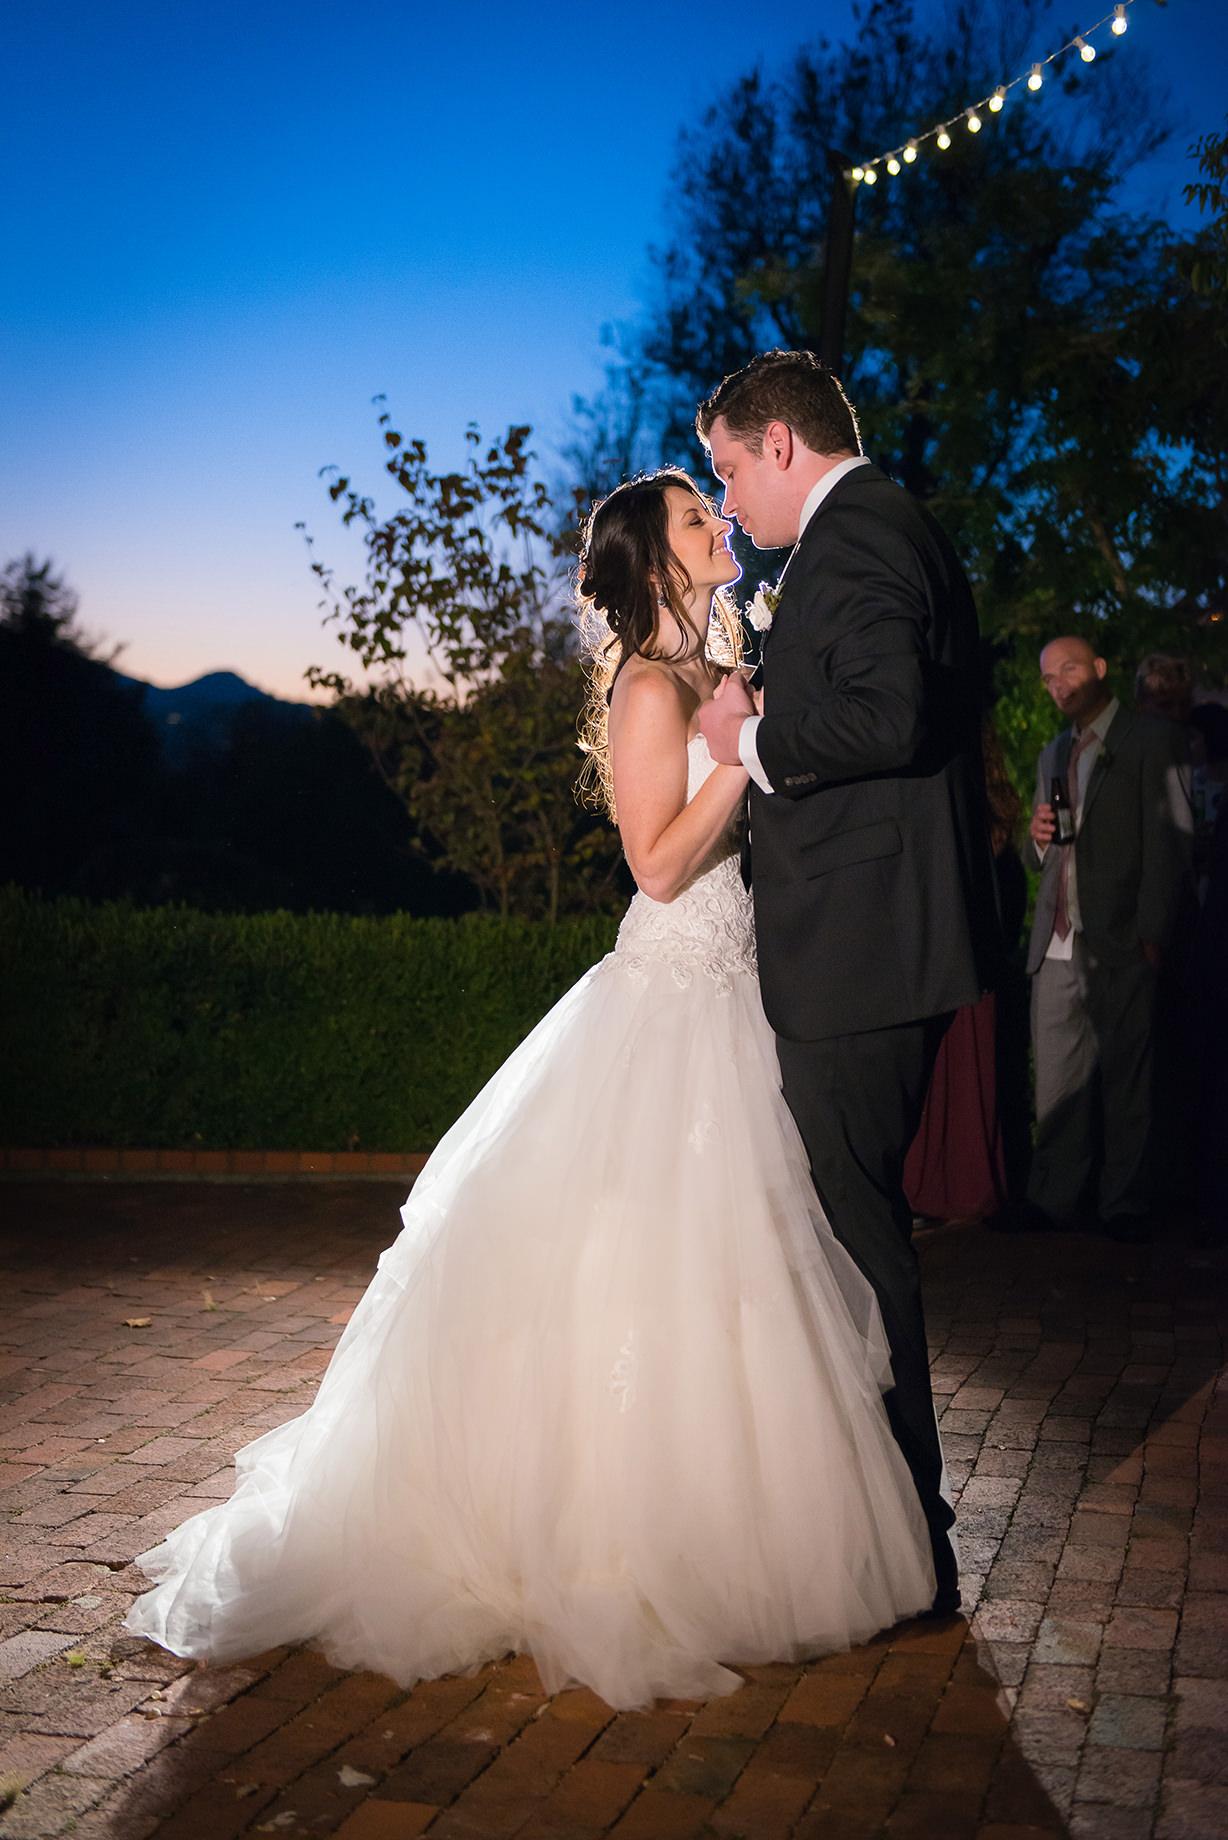 SAN-FRANCISCO-WEDDING-PHOTOGRAPHERS-THE-YODSUKARS-8507-ID-c707a946-3d39-4910-9a58-2a15bd9e6840.jpg